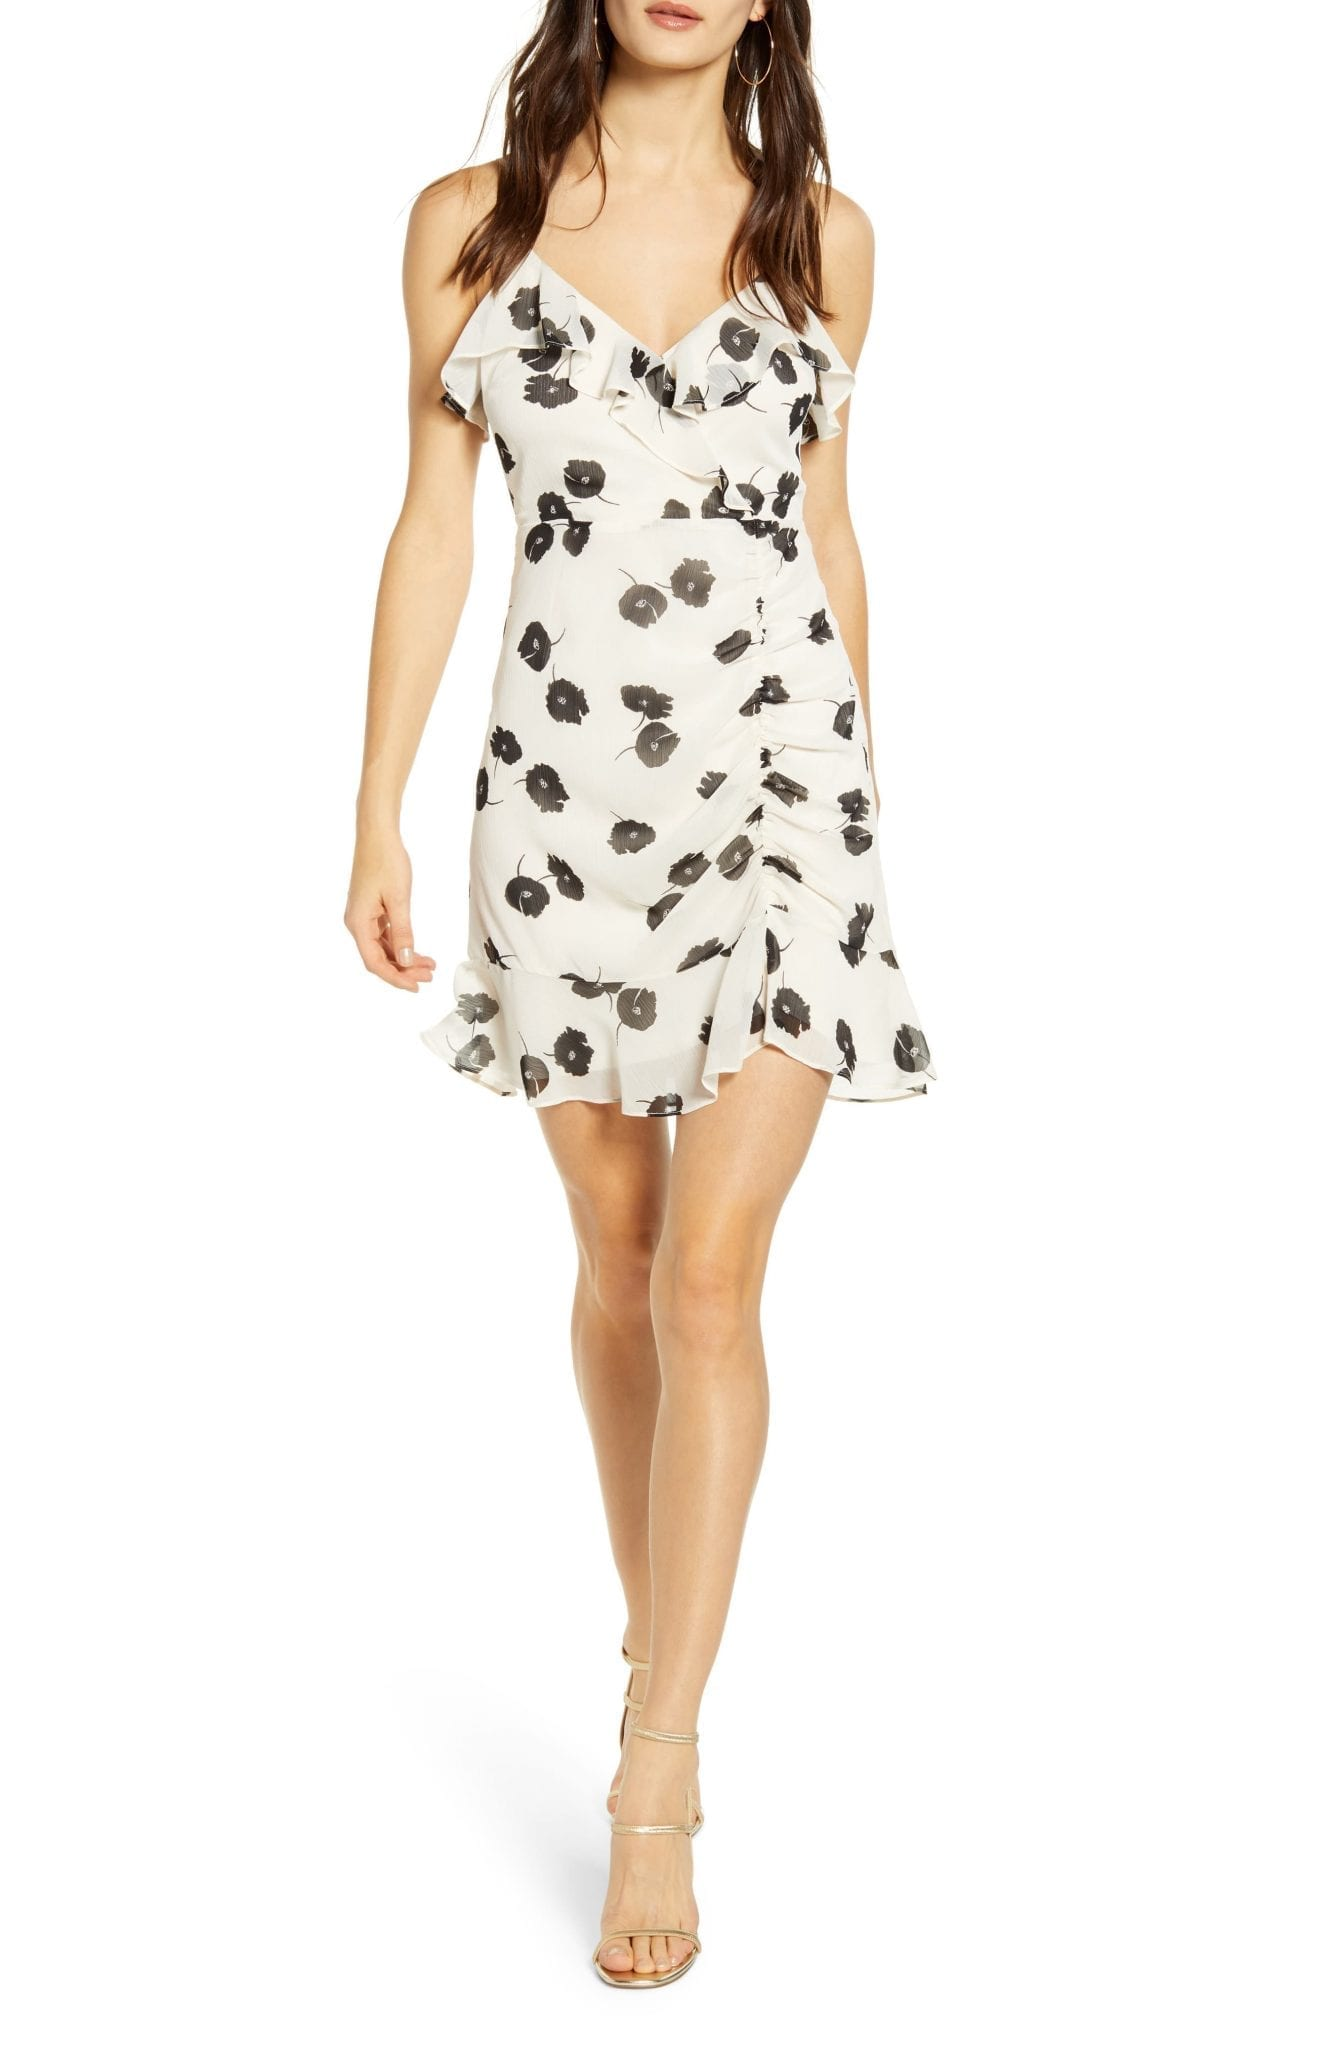 ALL IN FAVOR Callie Ruffle Mini dress